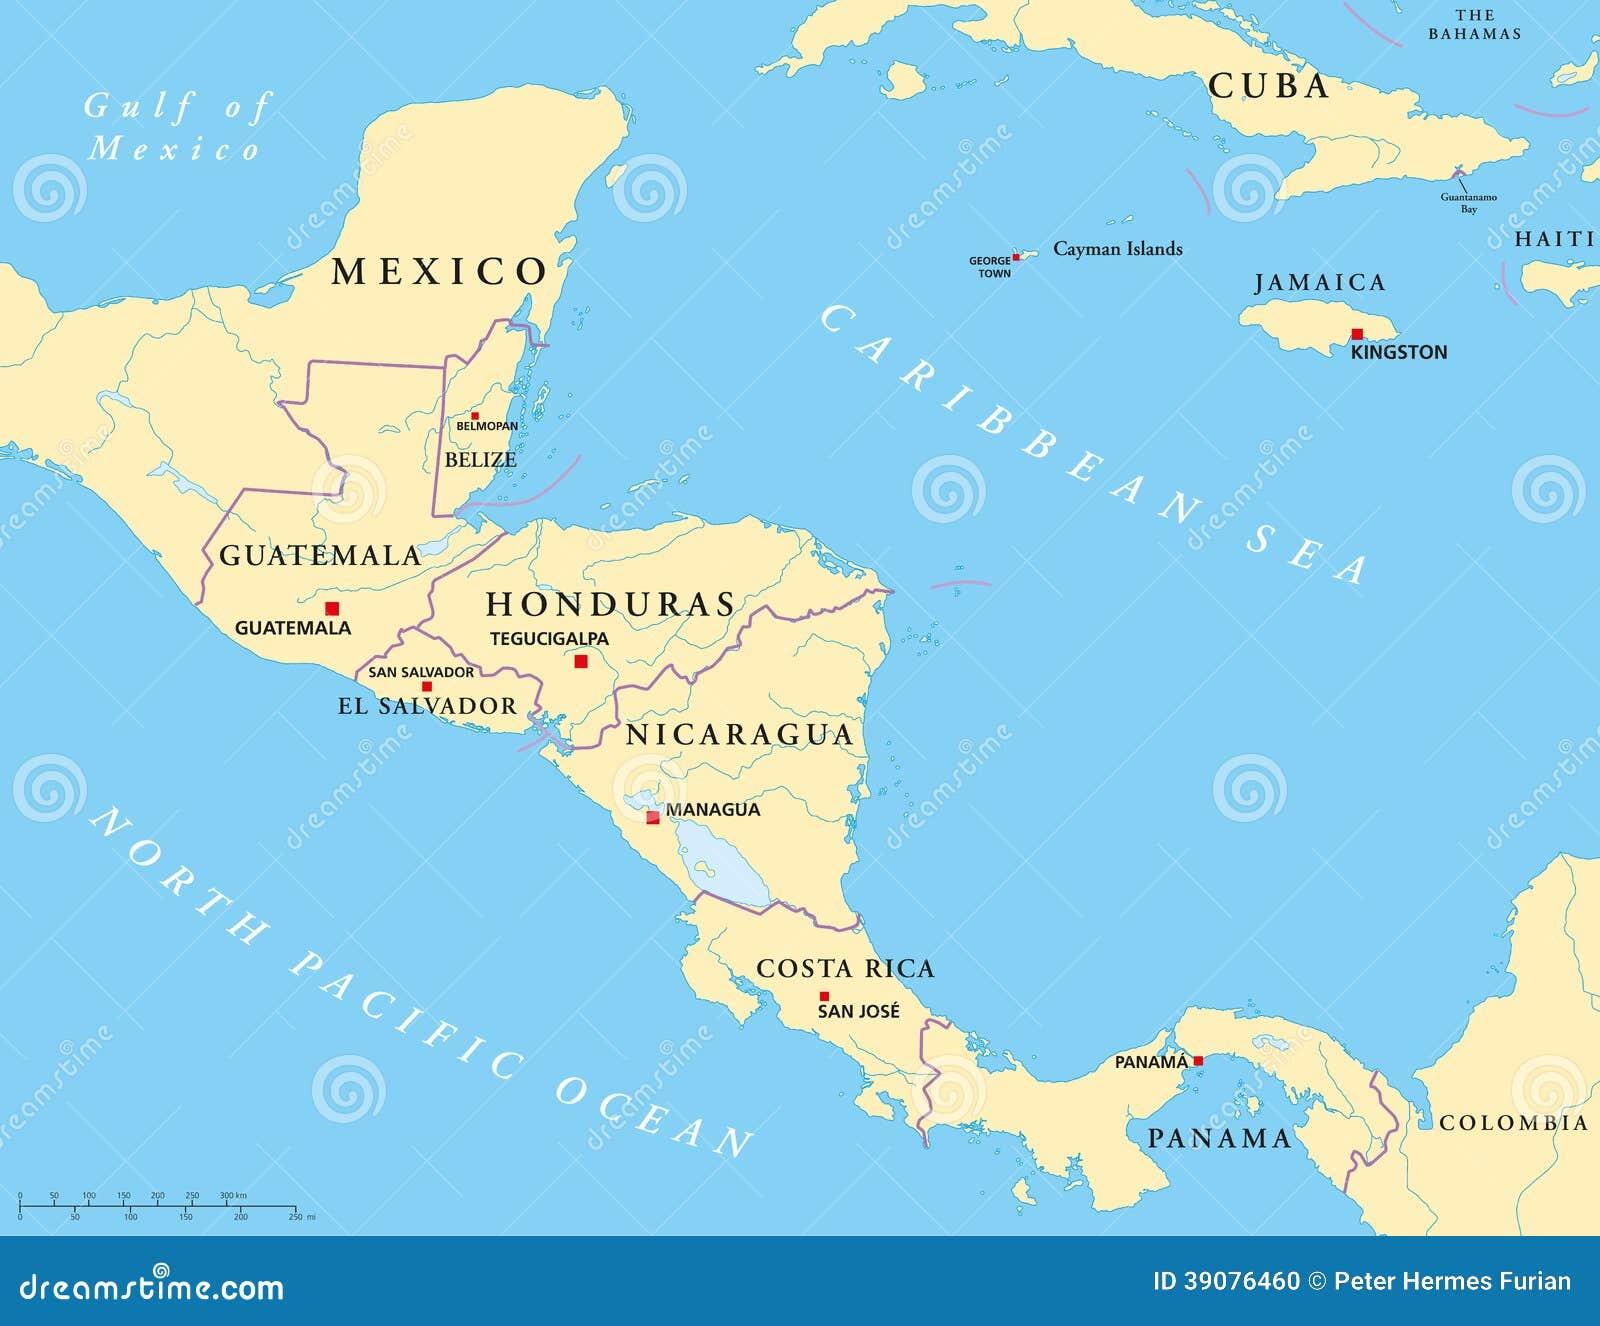 Politische Karte Mittelamerikas Vektor Abbildung Illustration